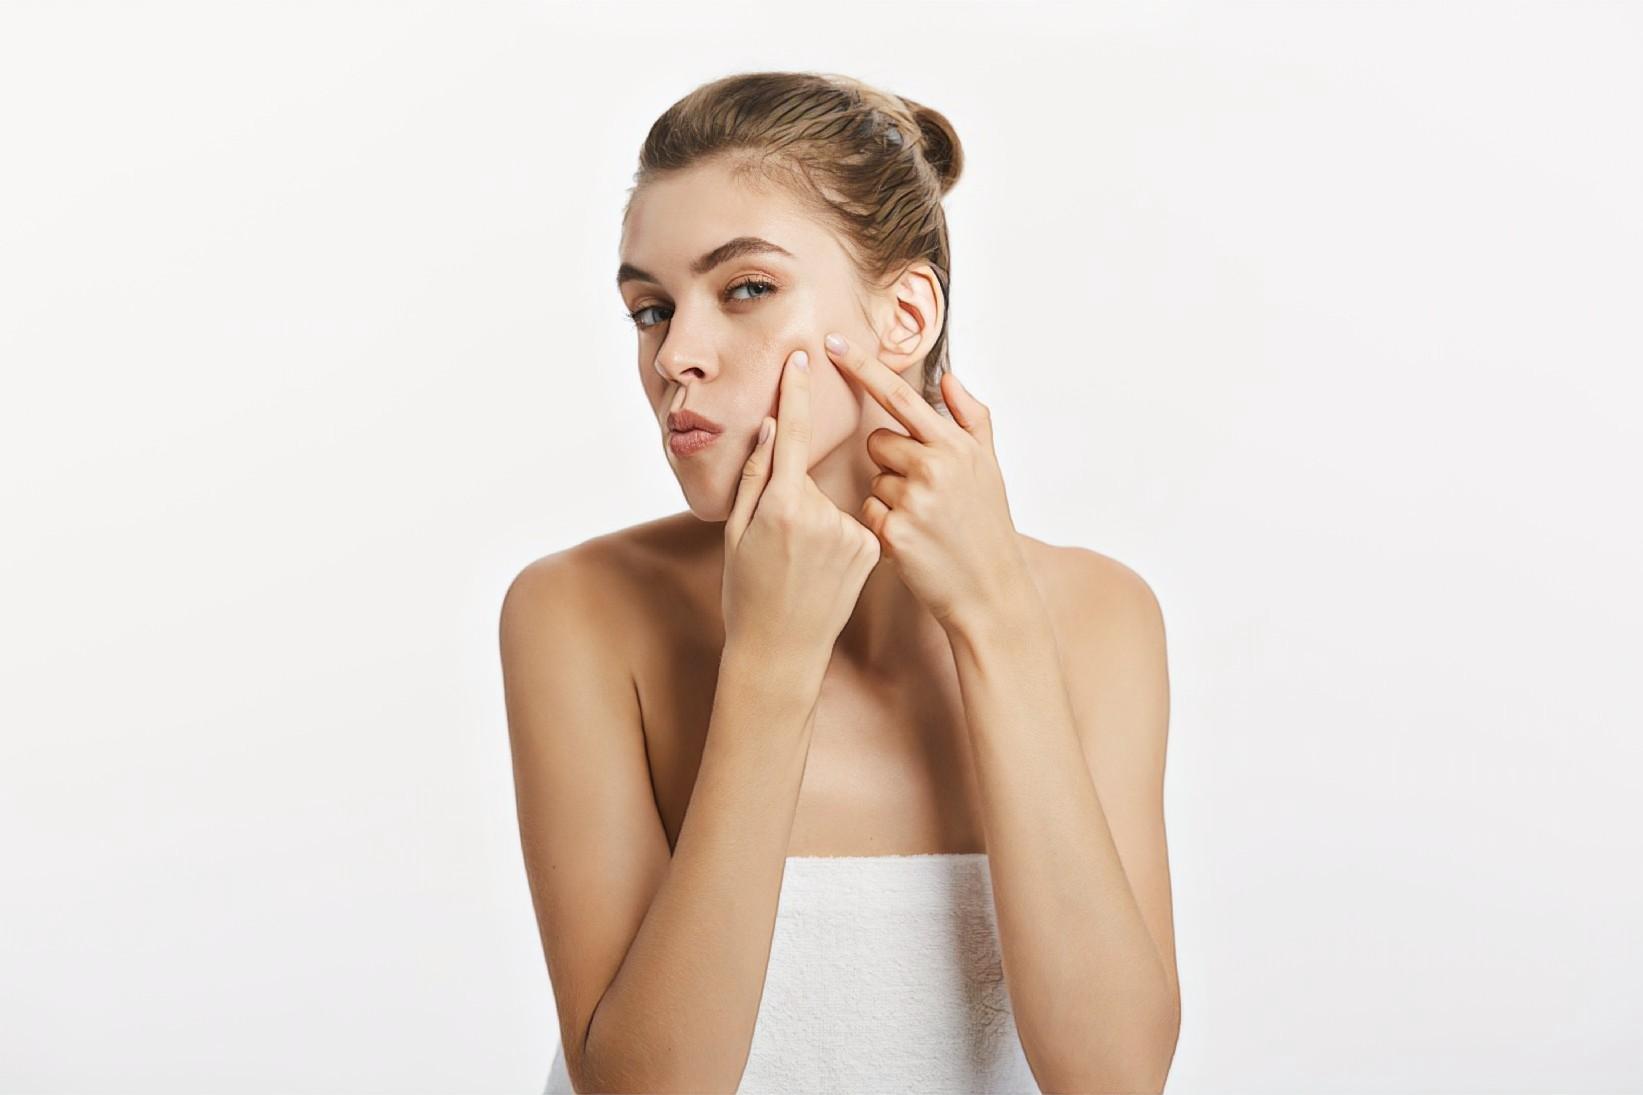 фото девушки с акне перед приемом у косметолога